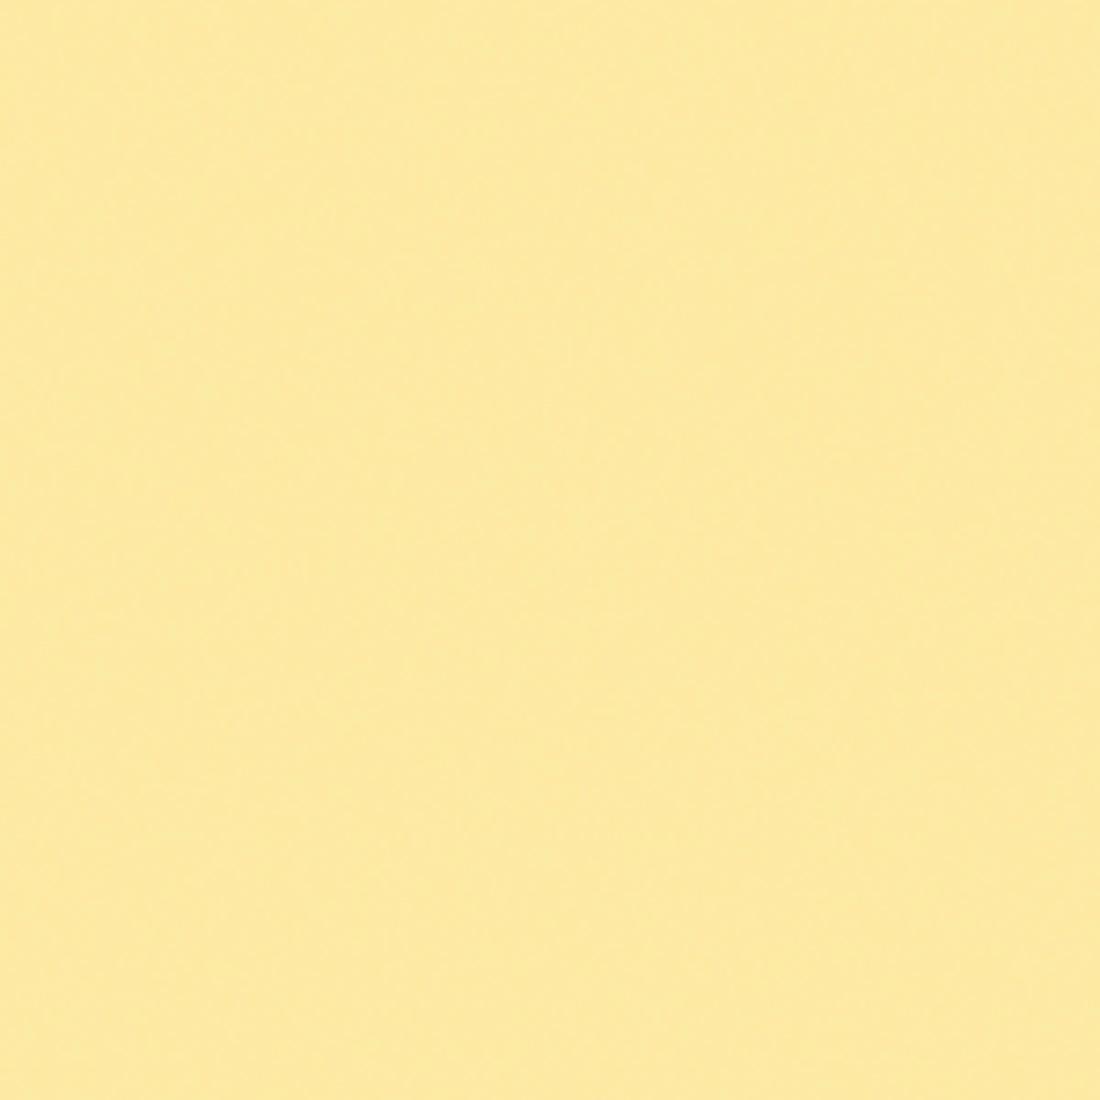 Dekor-Vanillegelbq2TlJ40902NmP